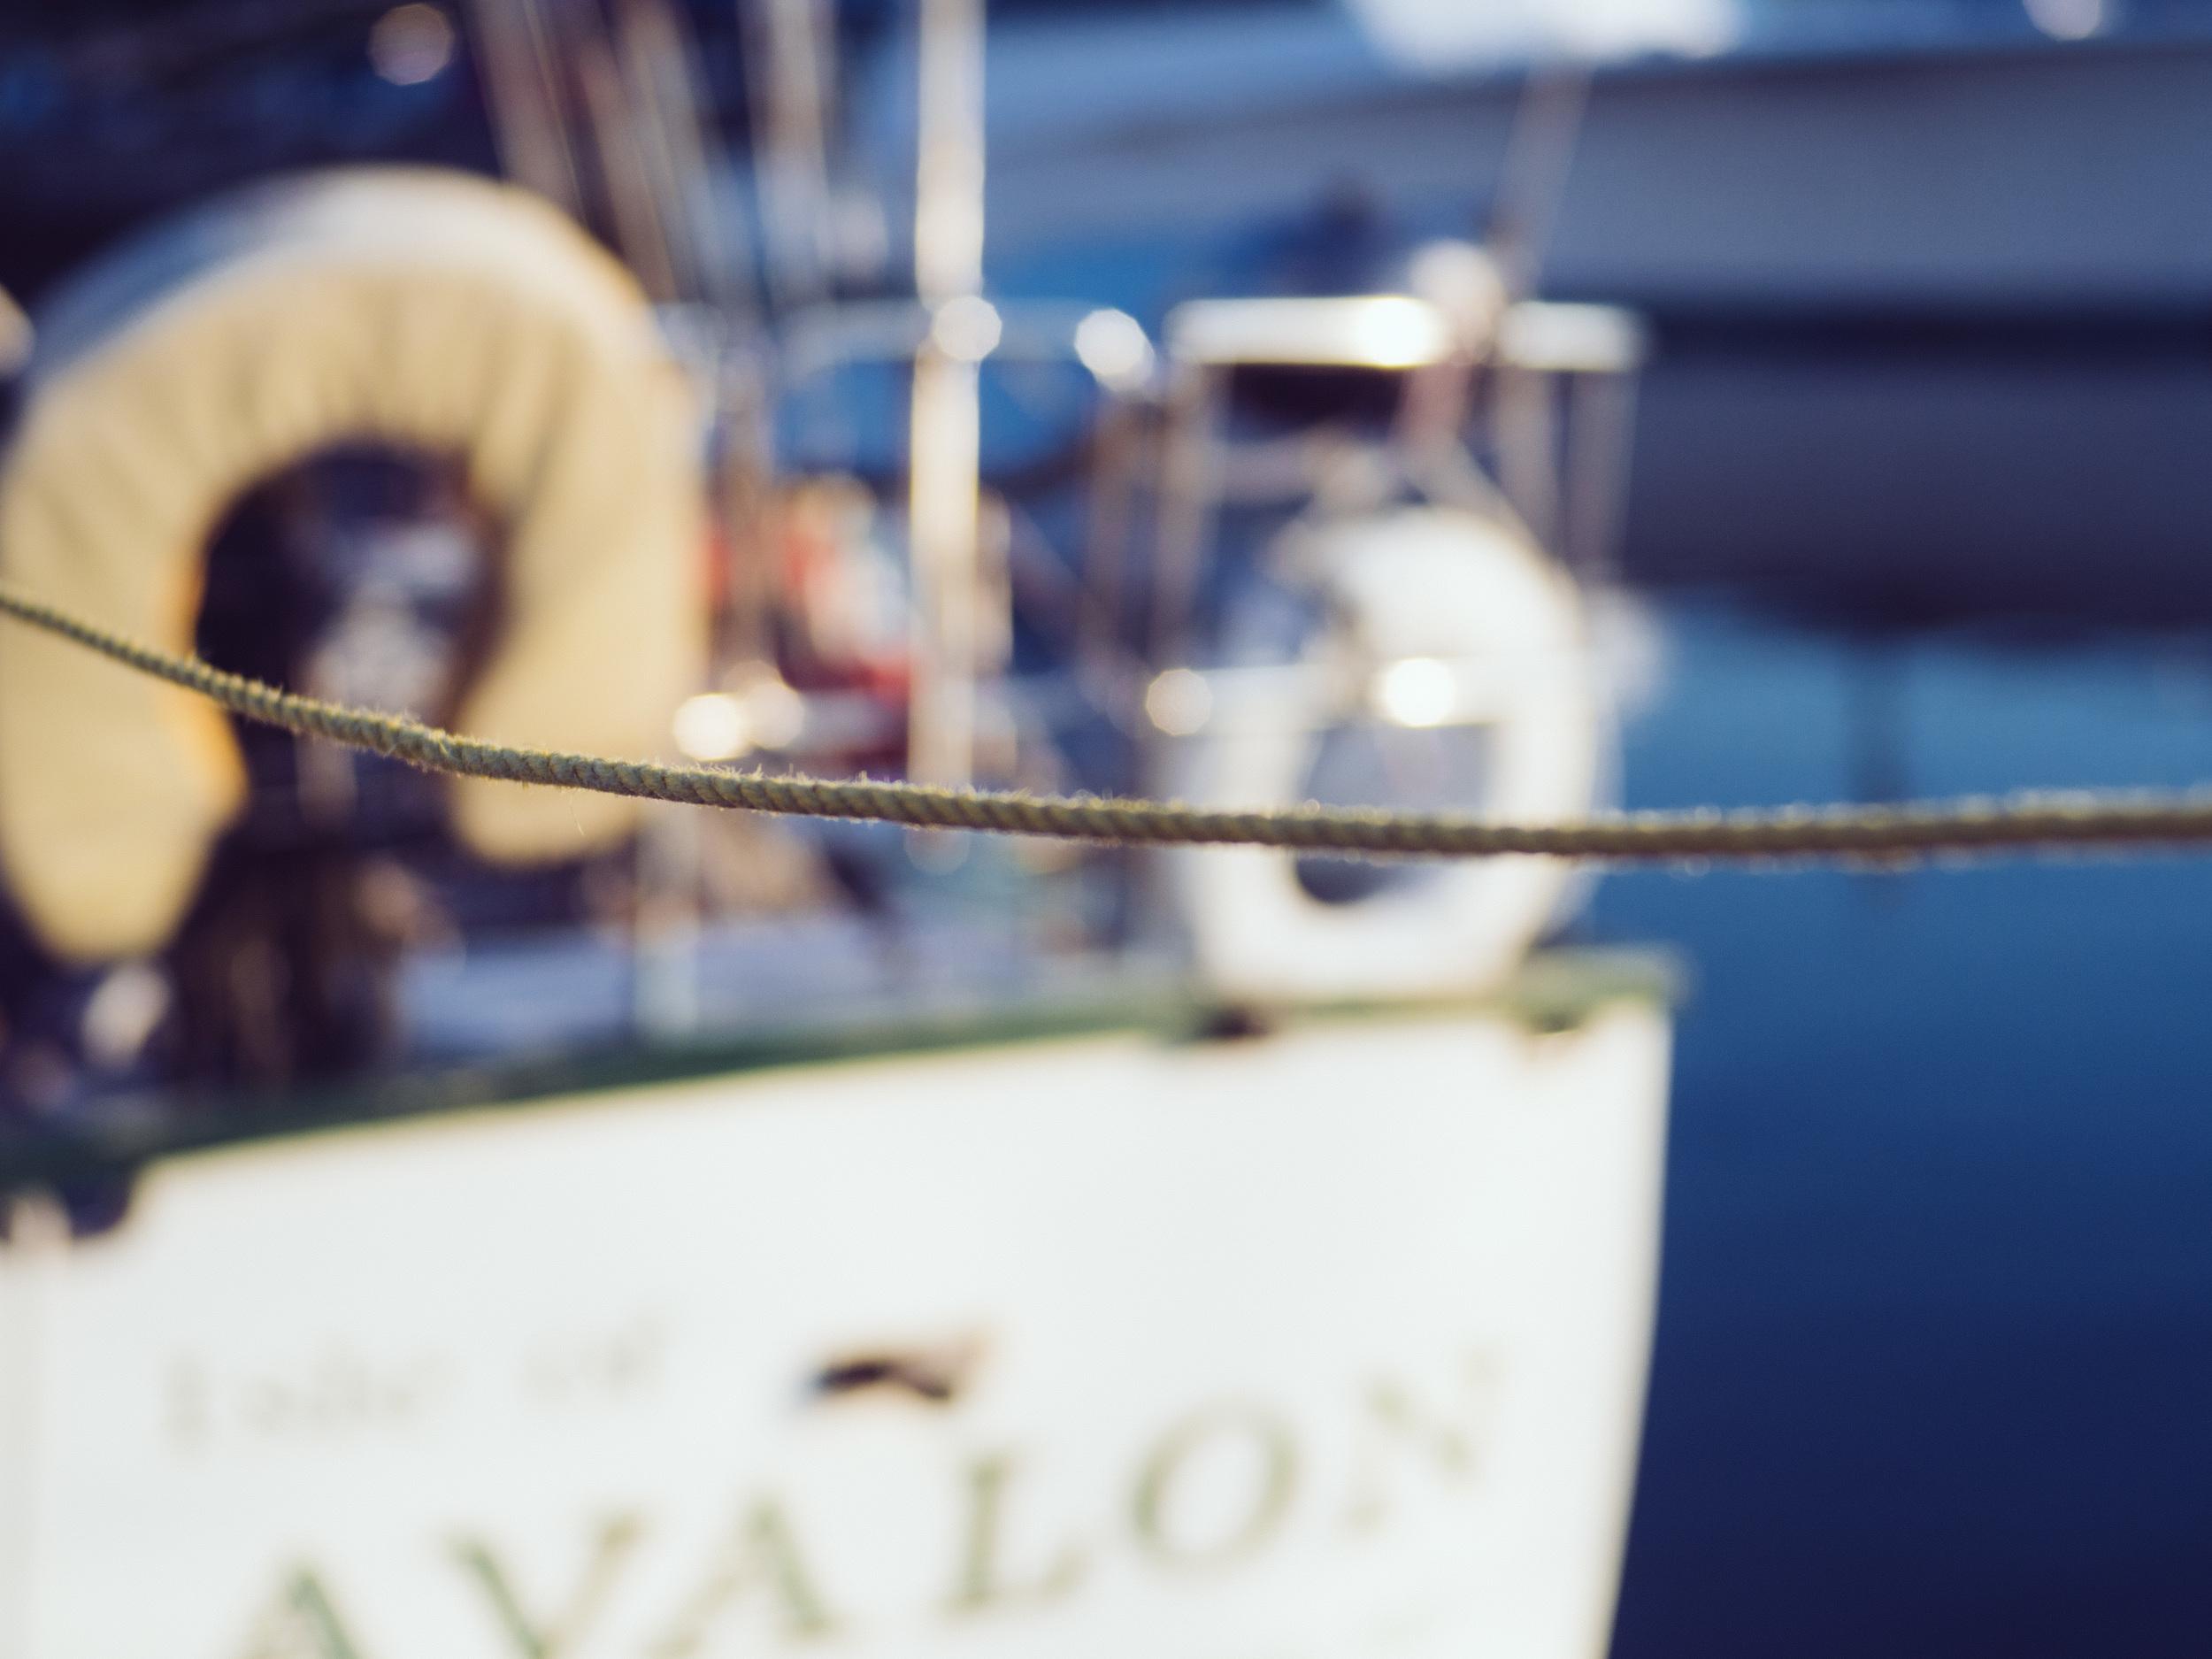 Ready to set sail - Olympus OM-D, Voigtlander Nokton 35mm f/1.4 - ISO 250, f/4.0, 1/2000sec